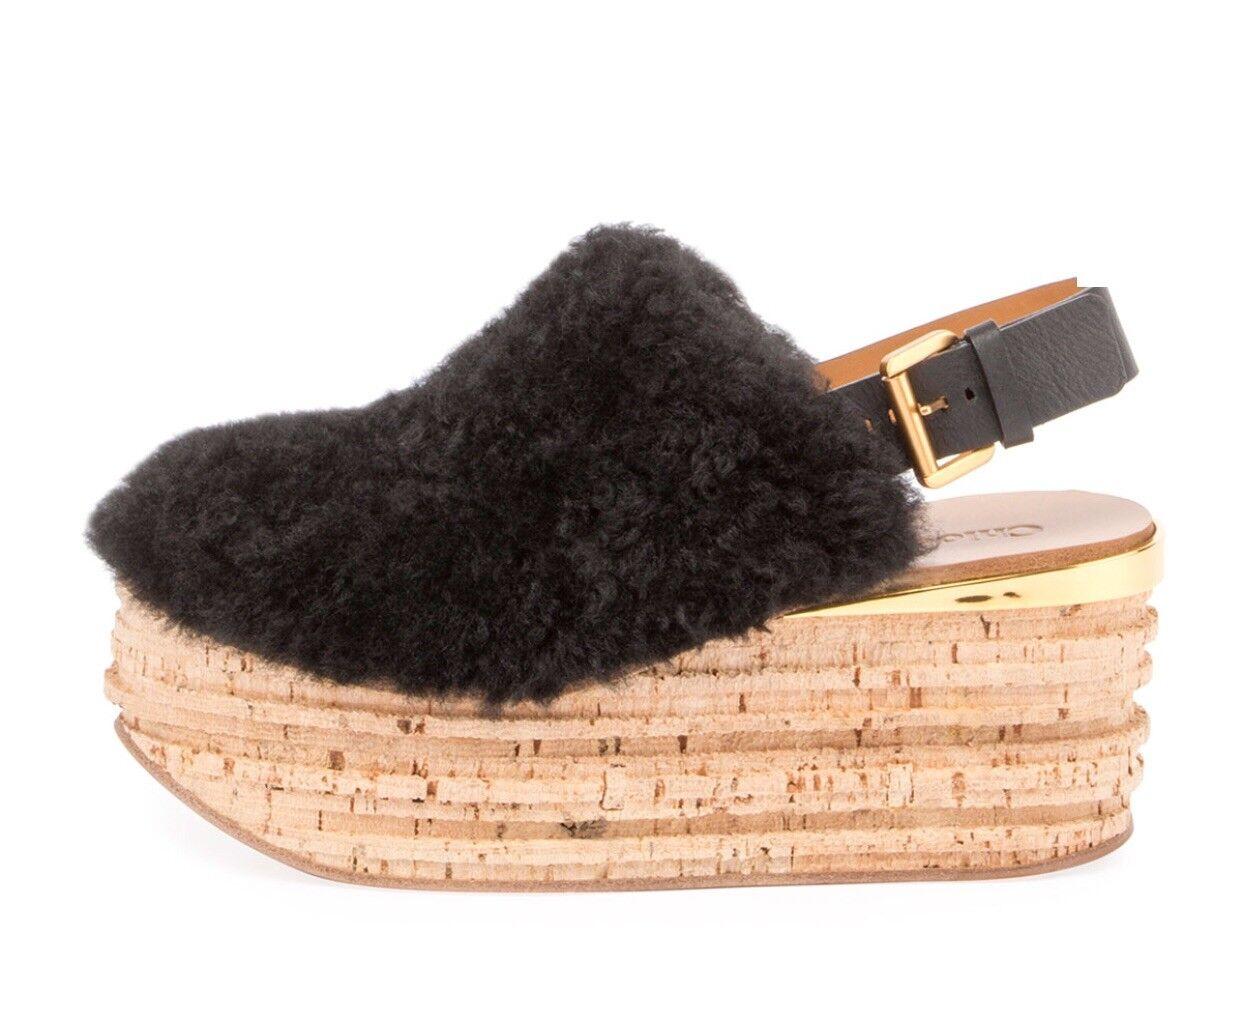 950 Chloe Camille Shearling Fur Platform Slide Slingback Sandals Black 41 NIB